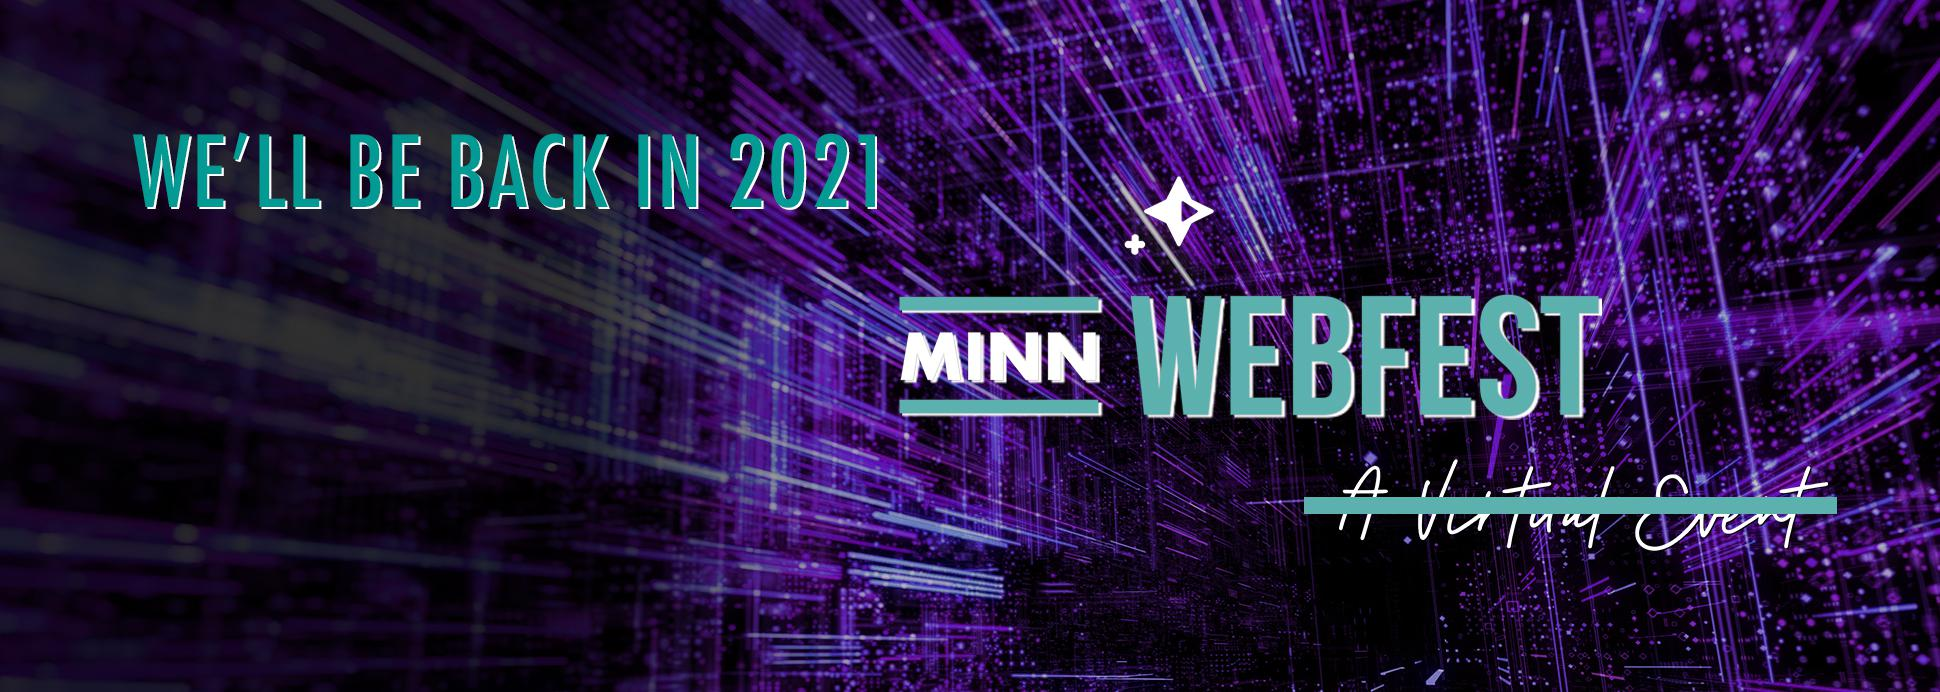 MNWF 2020